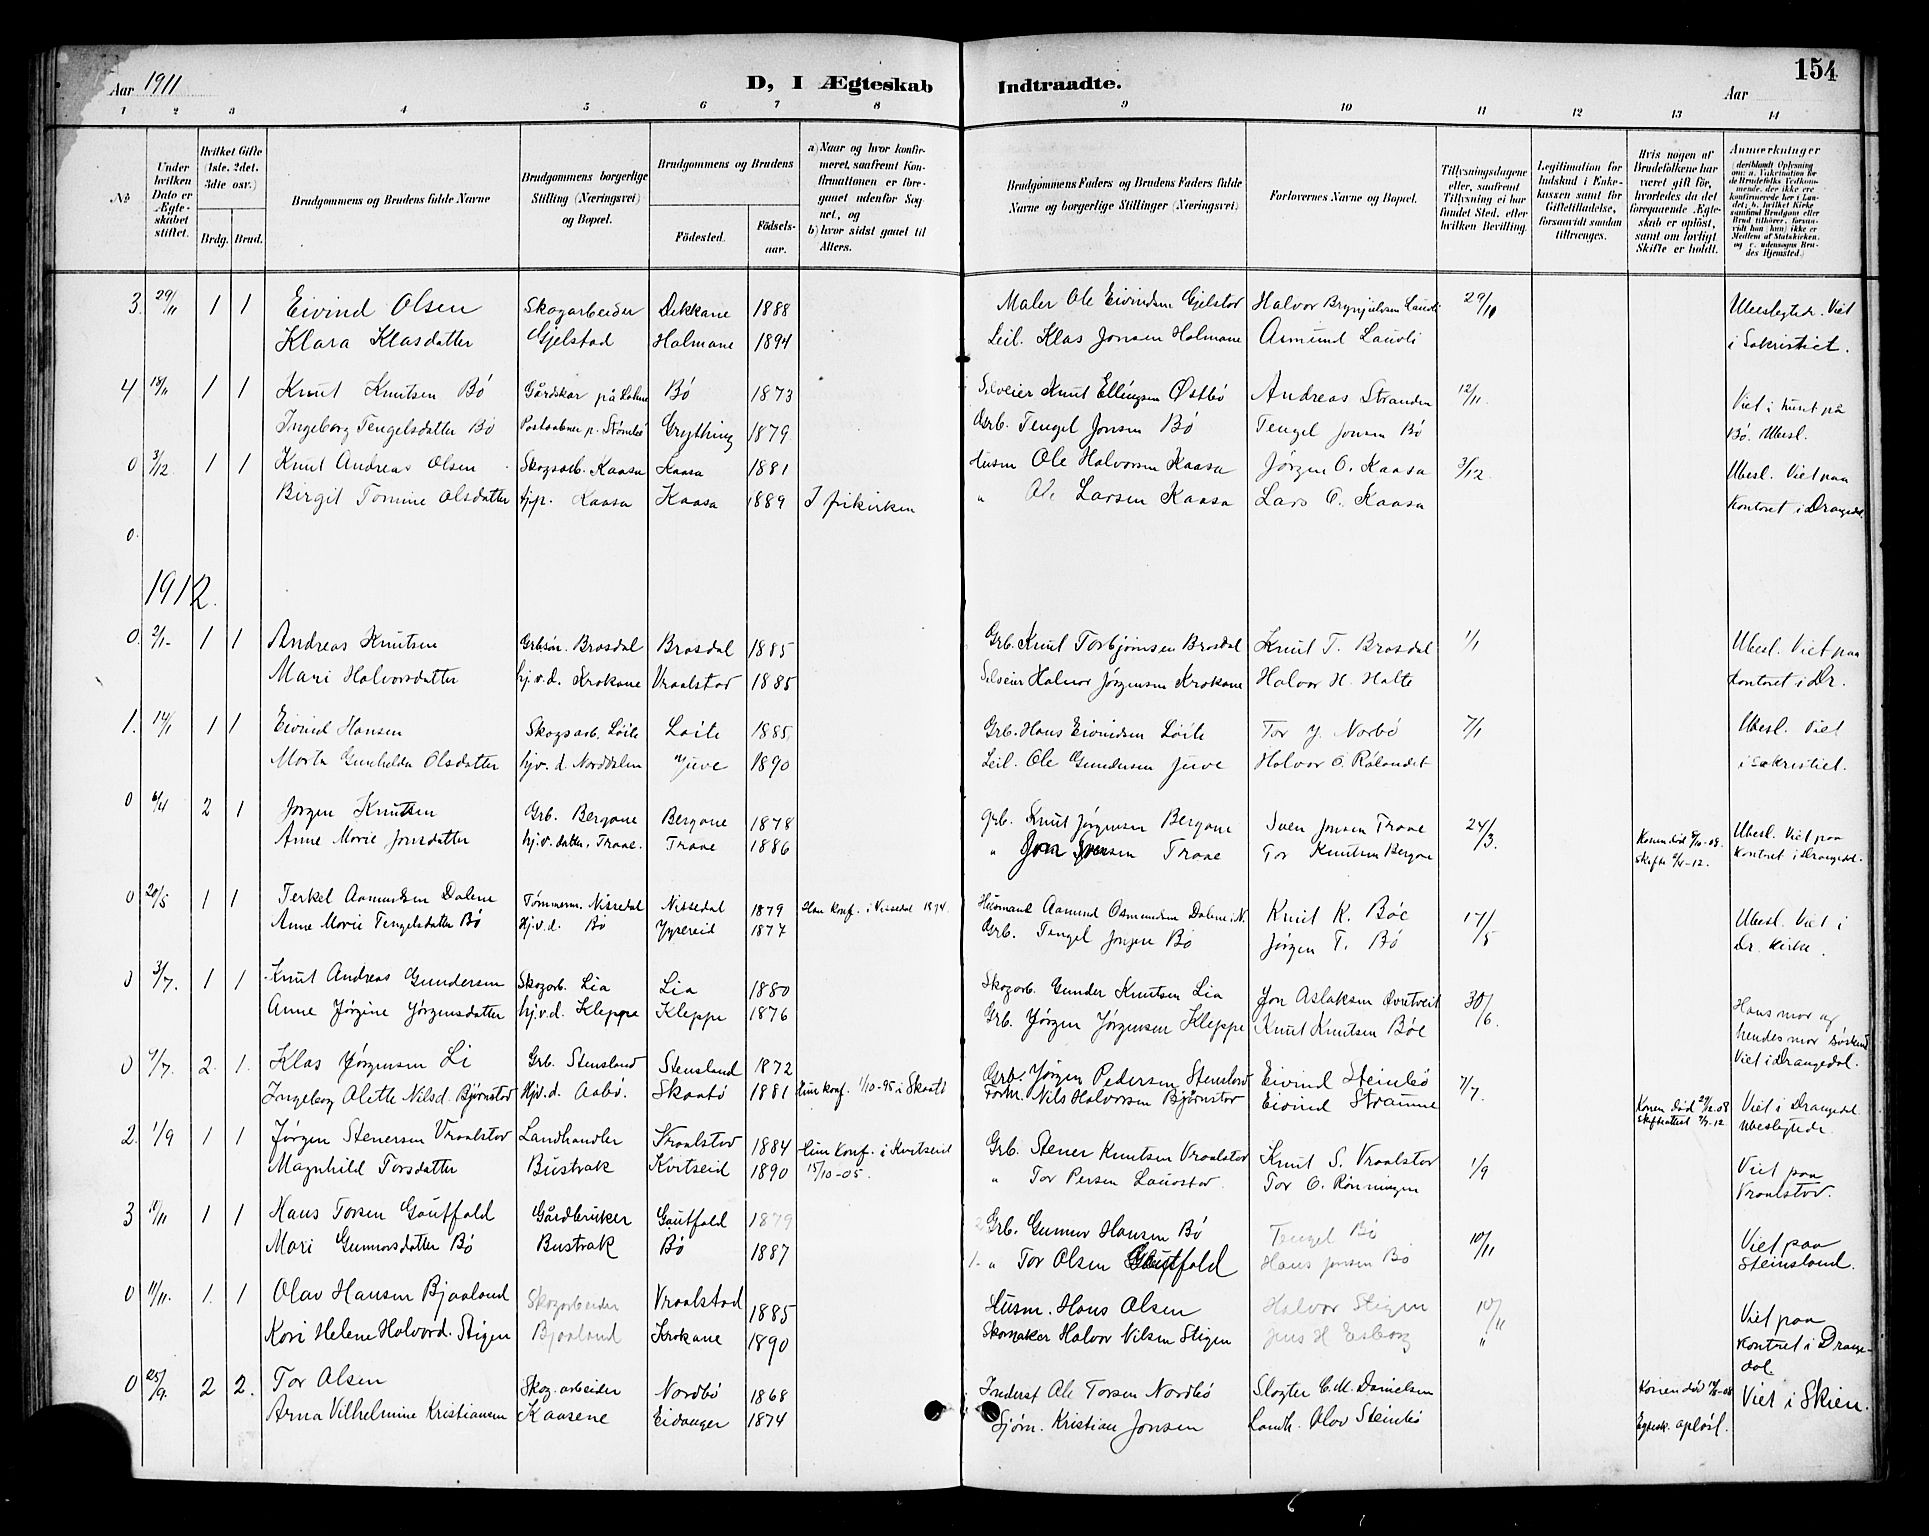 SAKO, Drangedal kirkebøker, G/Gb/L0002: Klokkerbok nr. II 2, 1895-1918, s. 154